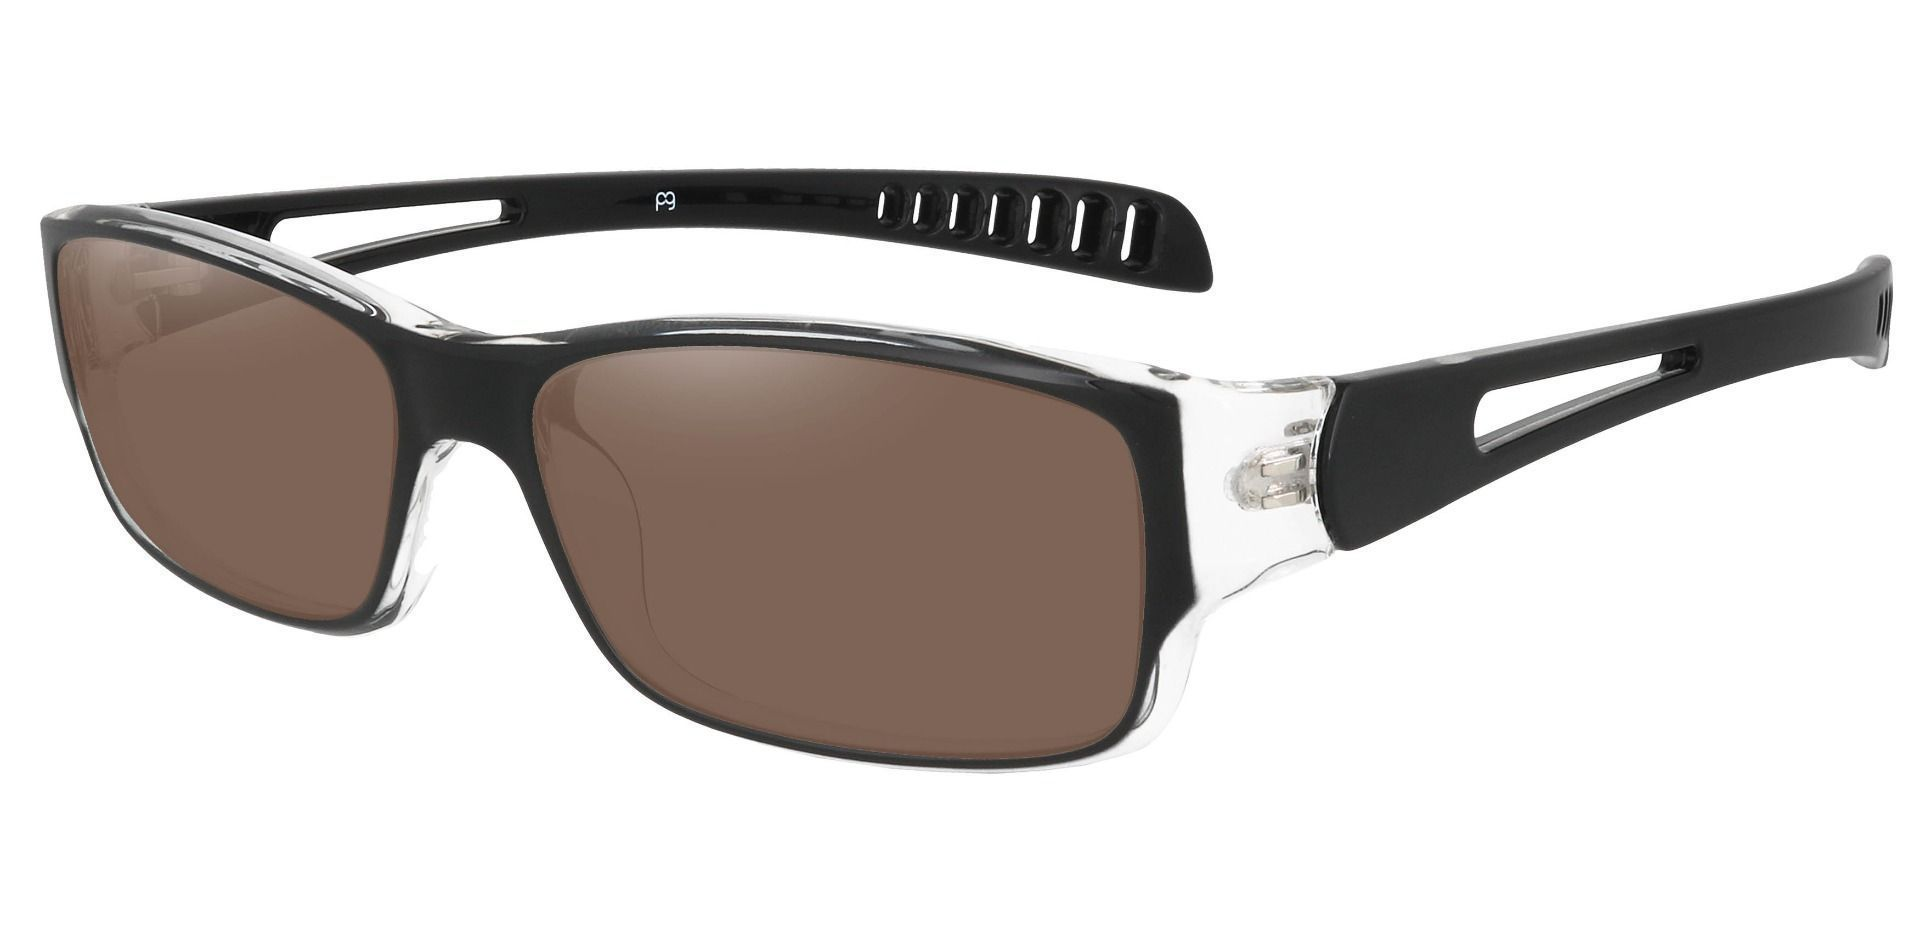 Mercury Rectangle Prescription Sunglasses - Black Frame With Brown Lenses